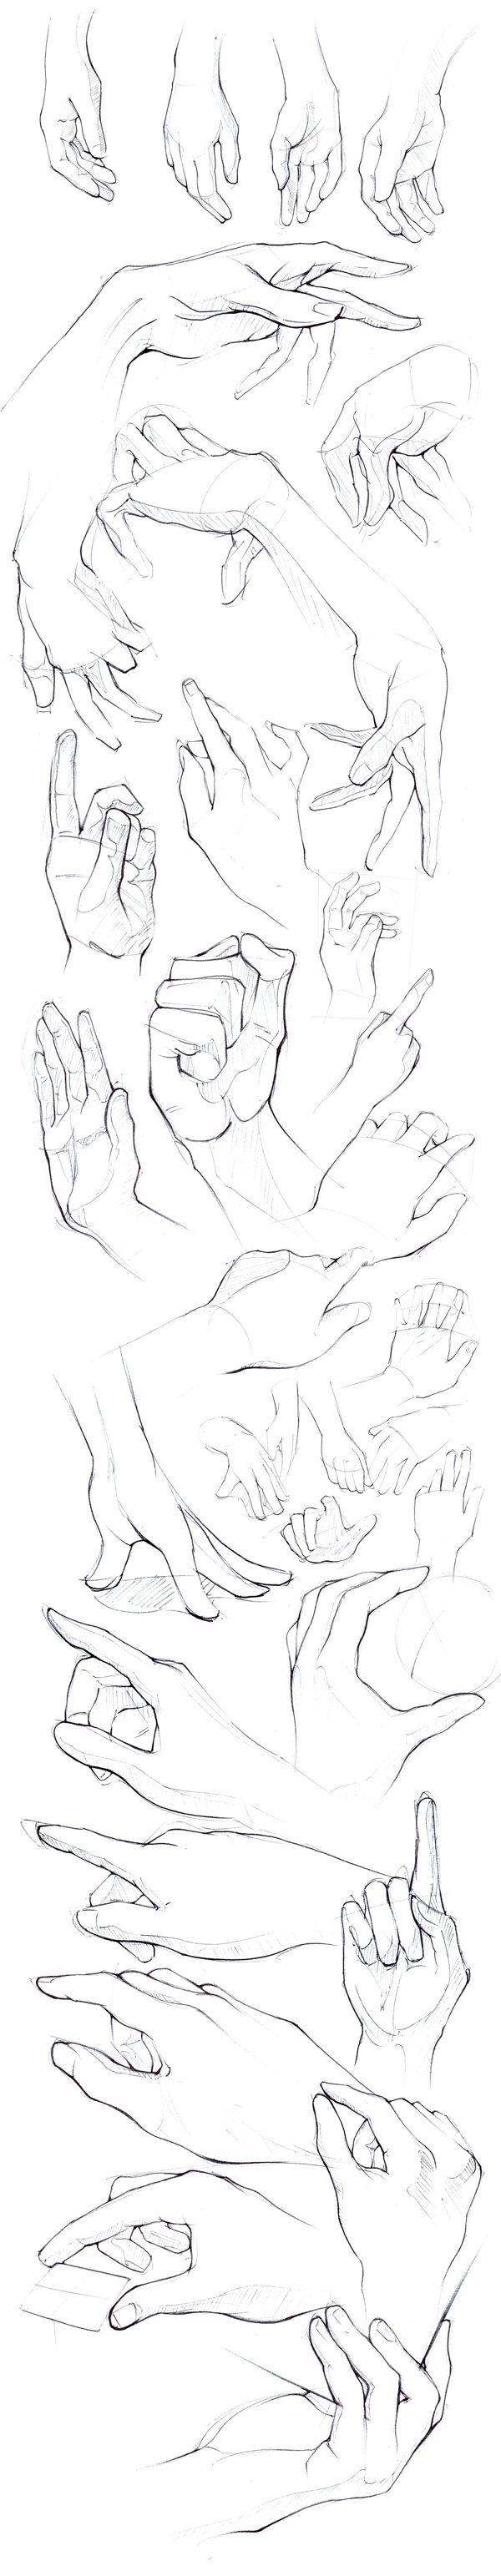 Summer Sketches on Behance